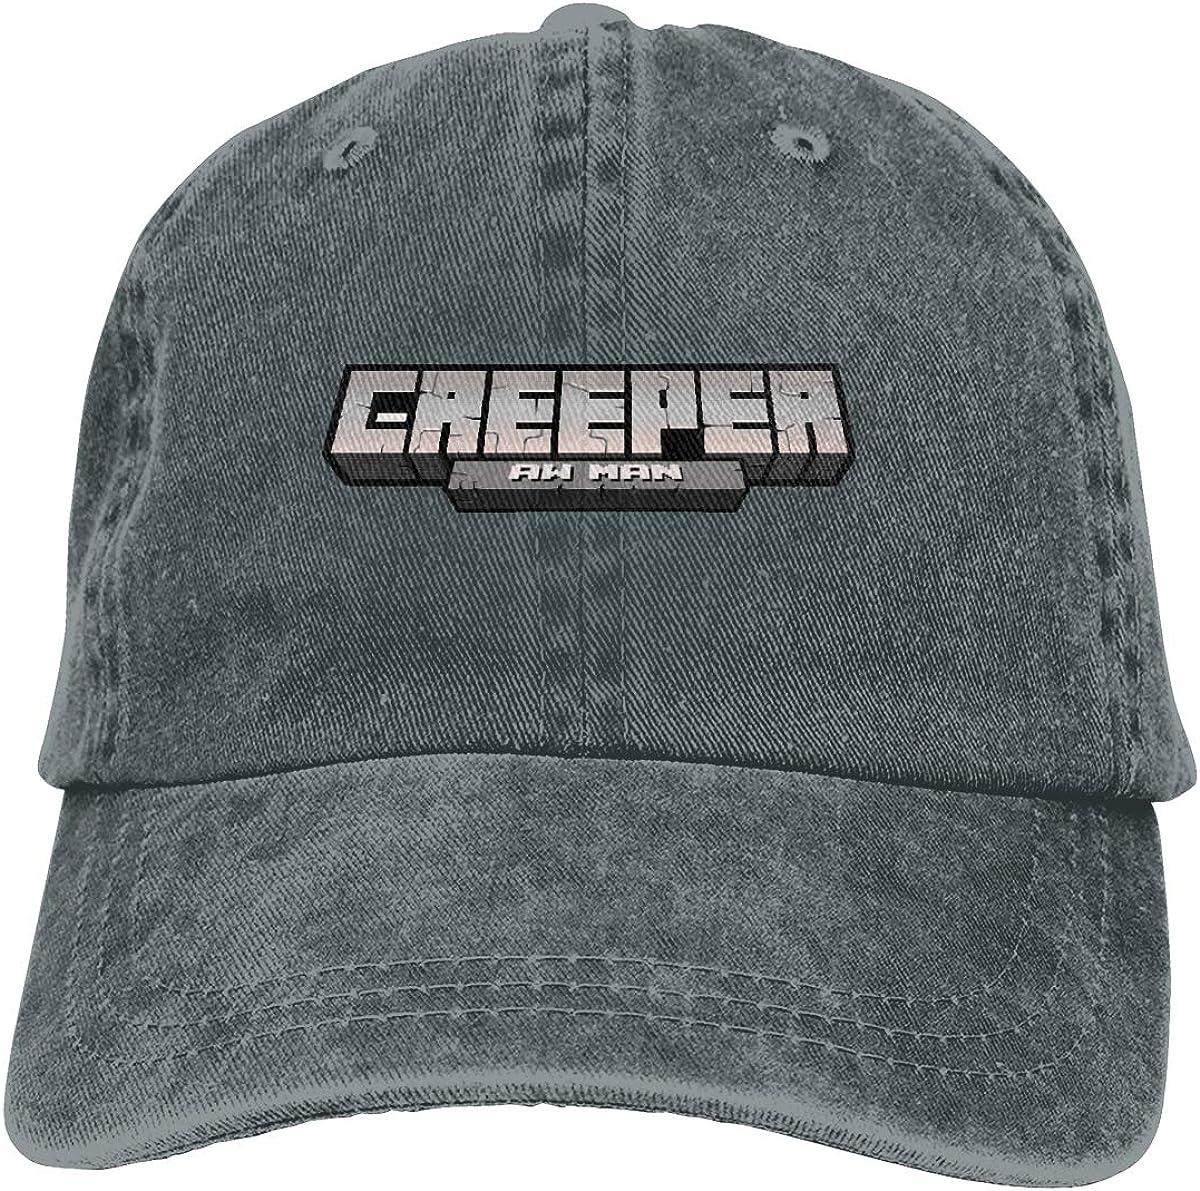 Men's Women's Creeper Aw...